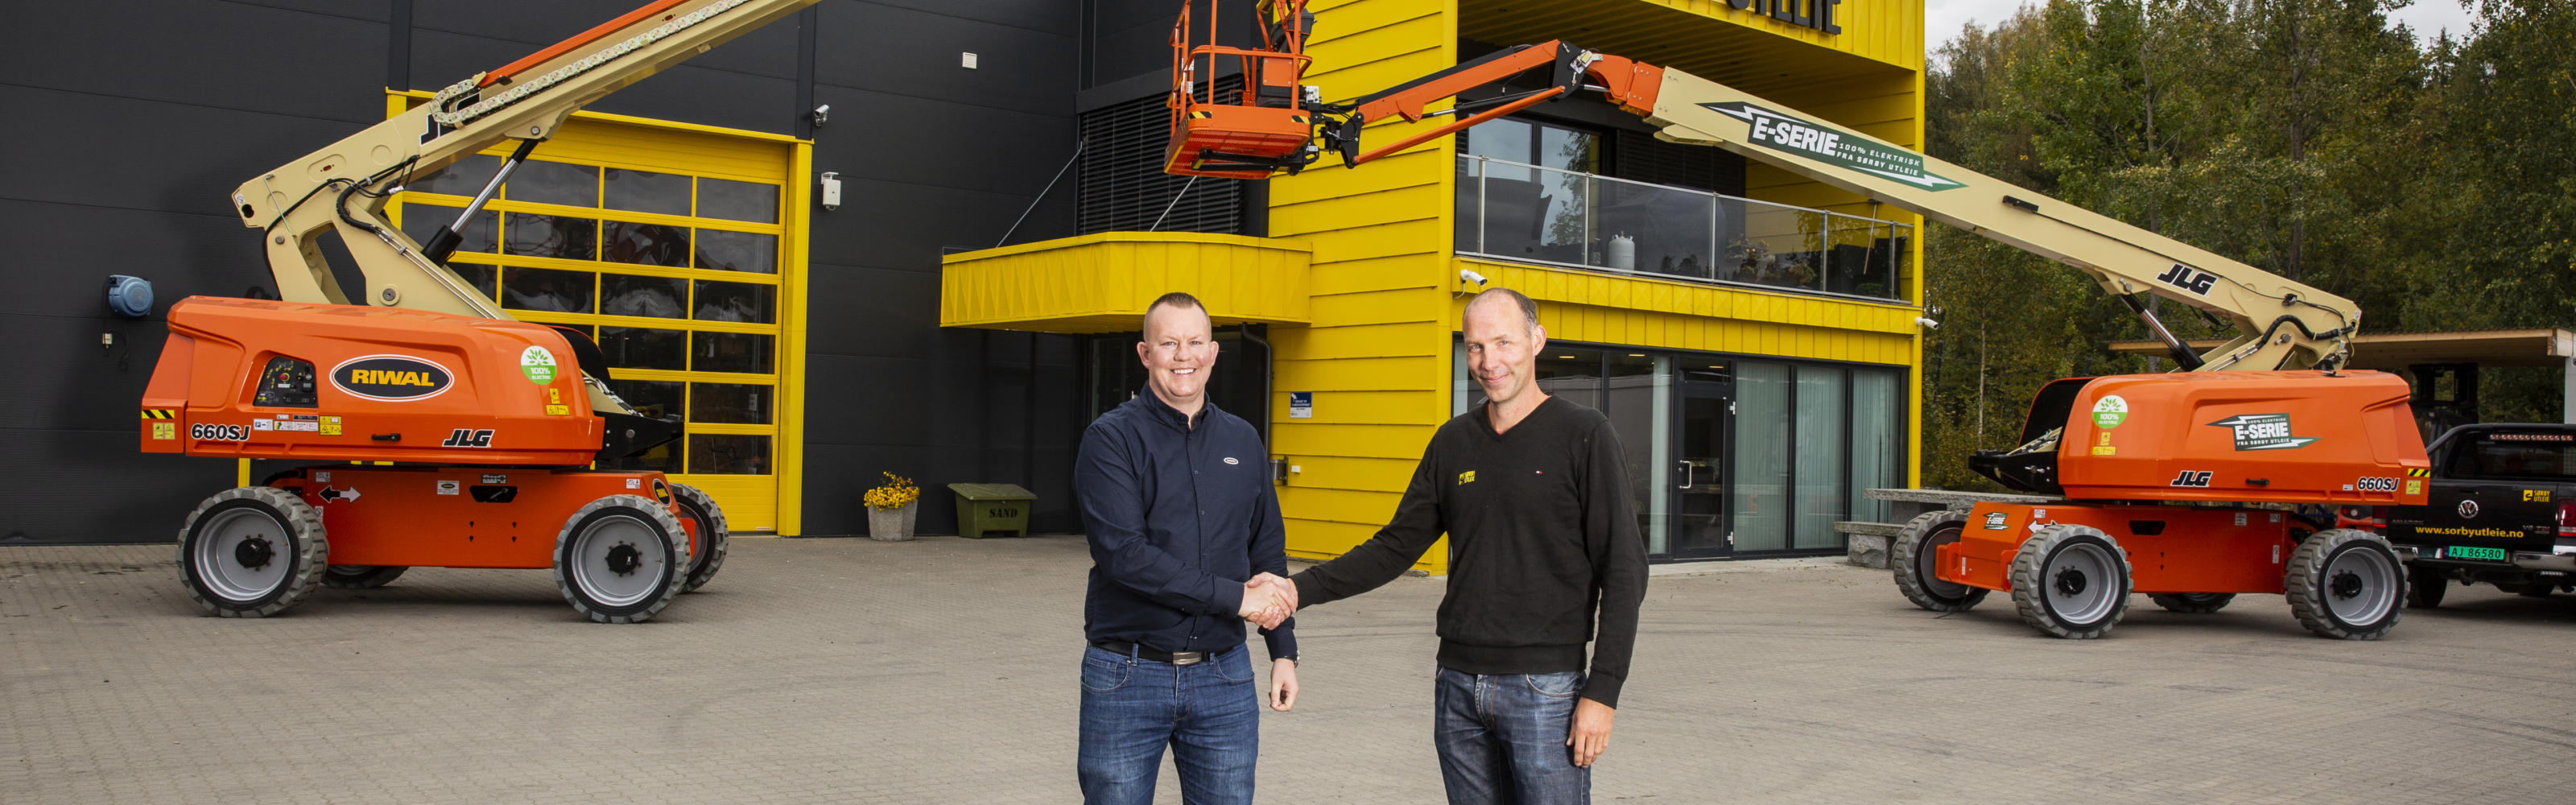 Riwal-Jesper-Becker-and-Lars-Sorby-1.JPG